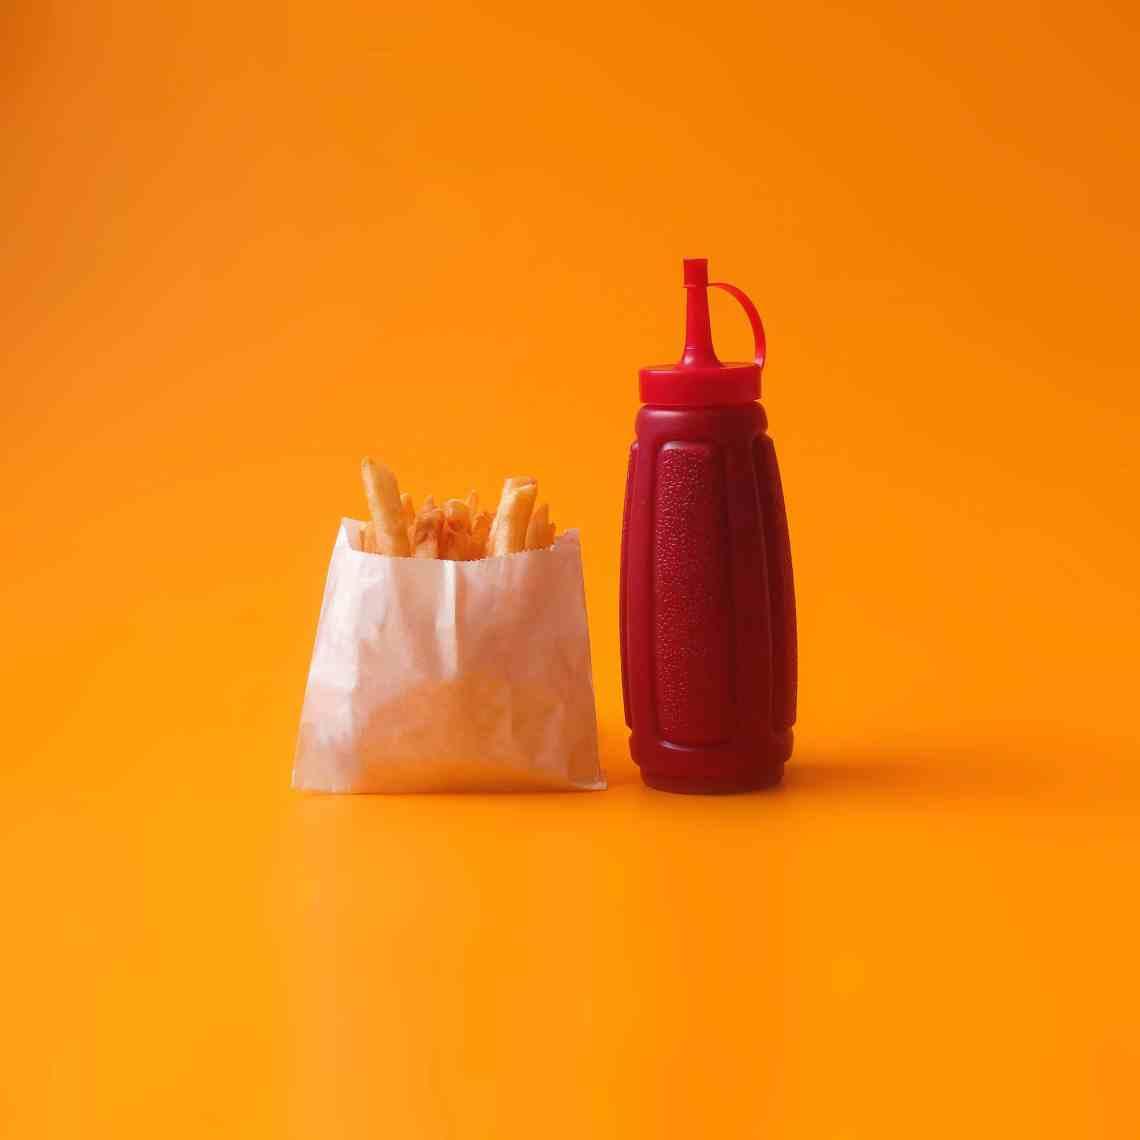 The Ketchup Story